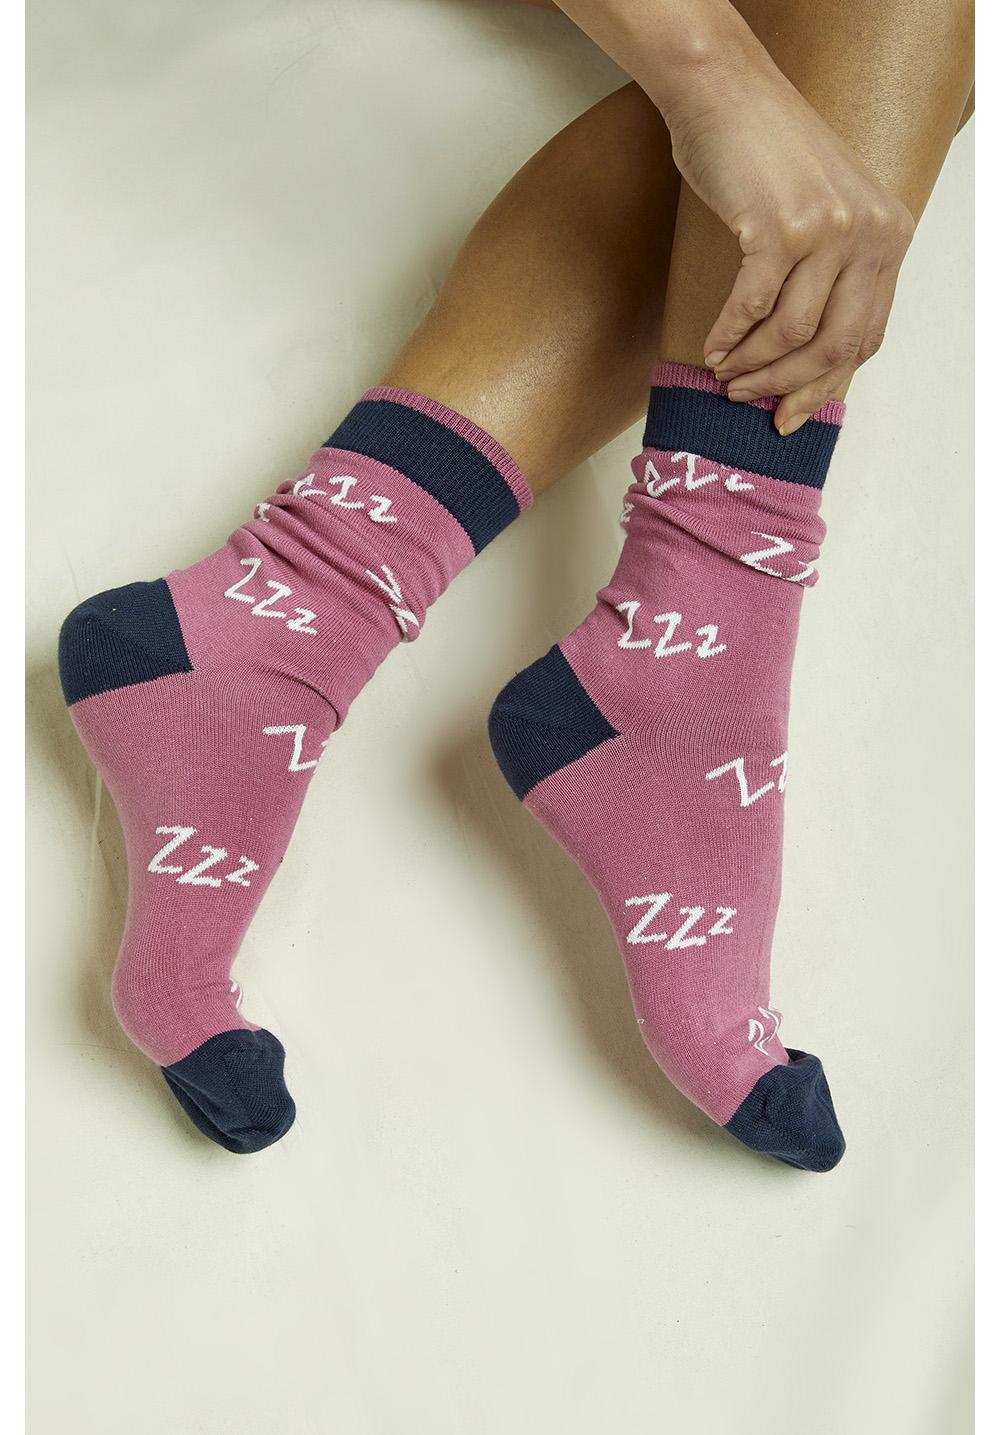 ZZZ Socks